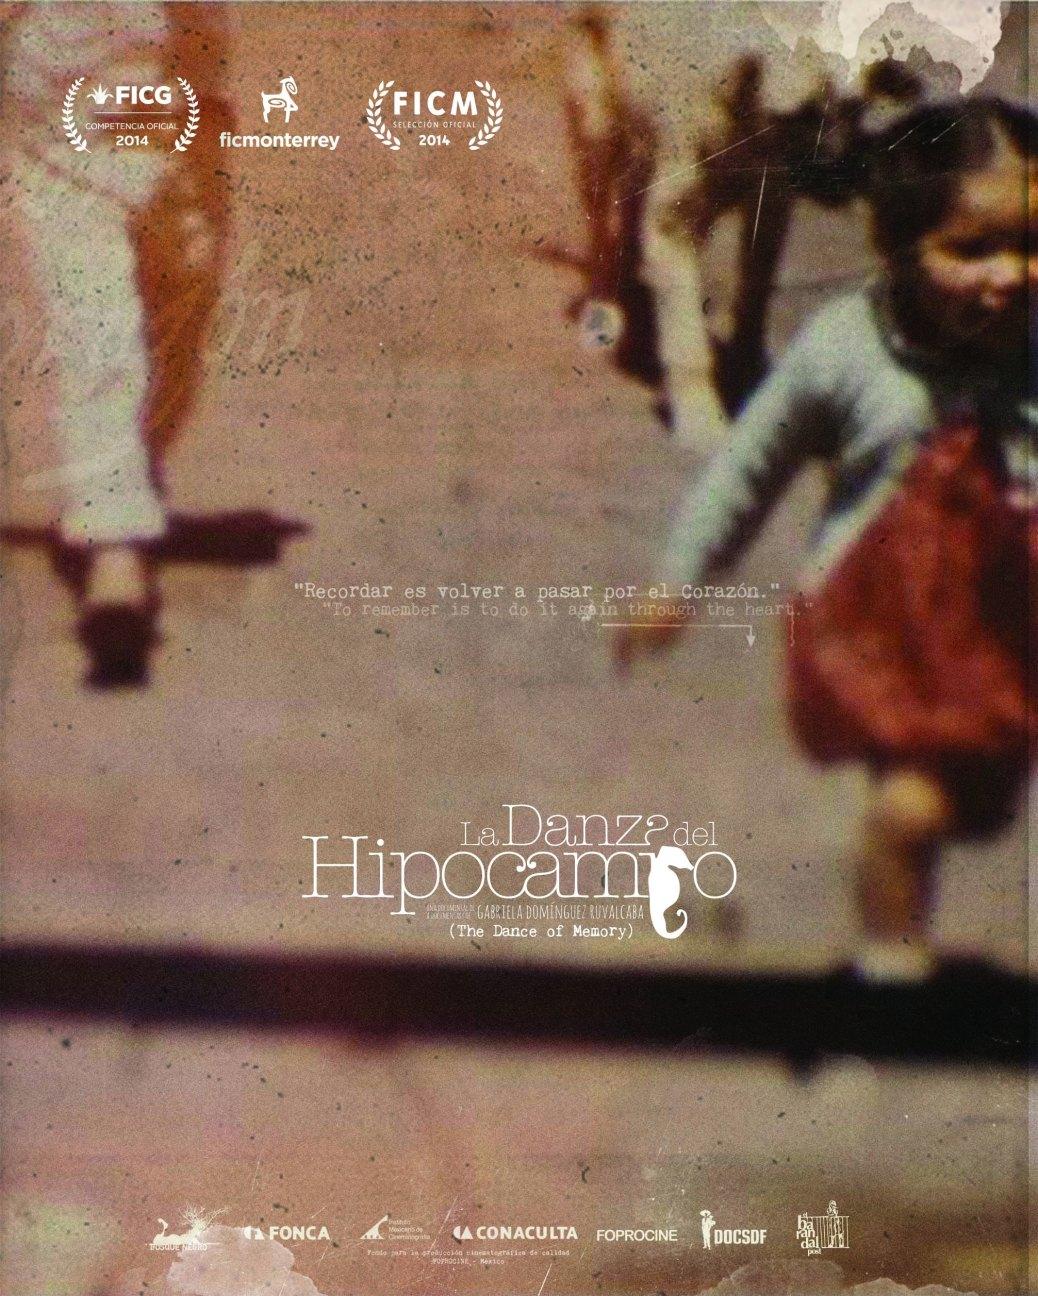 danza hipocampo poster